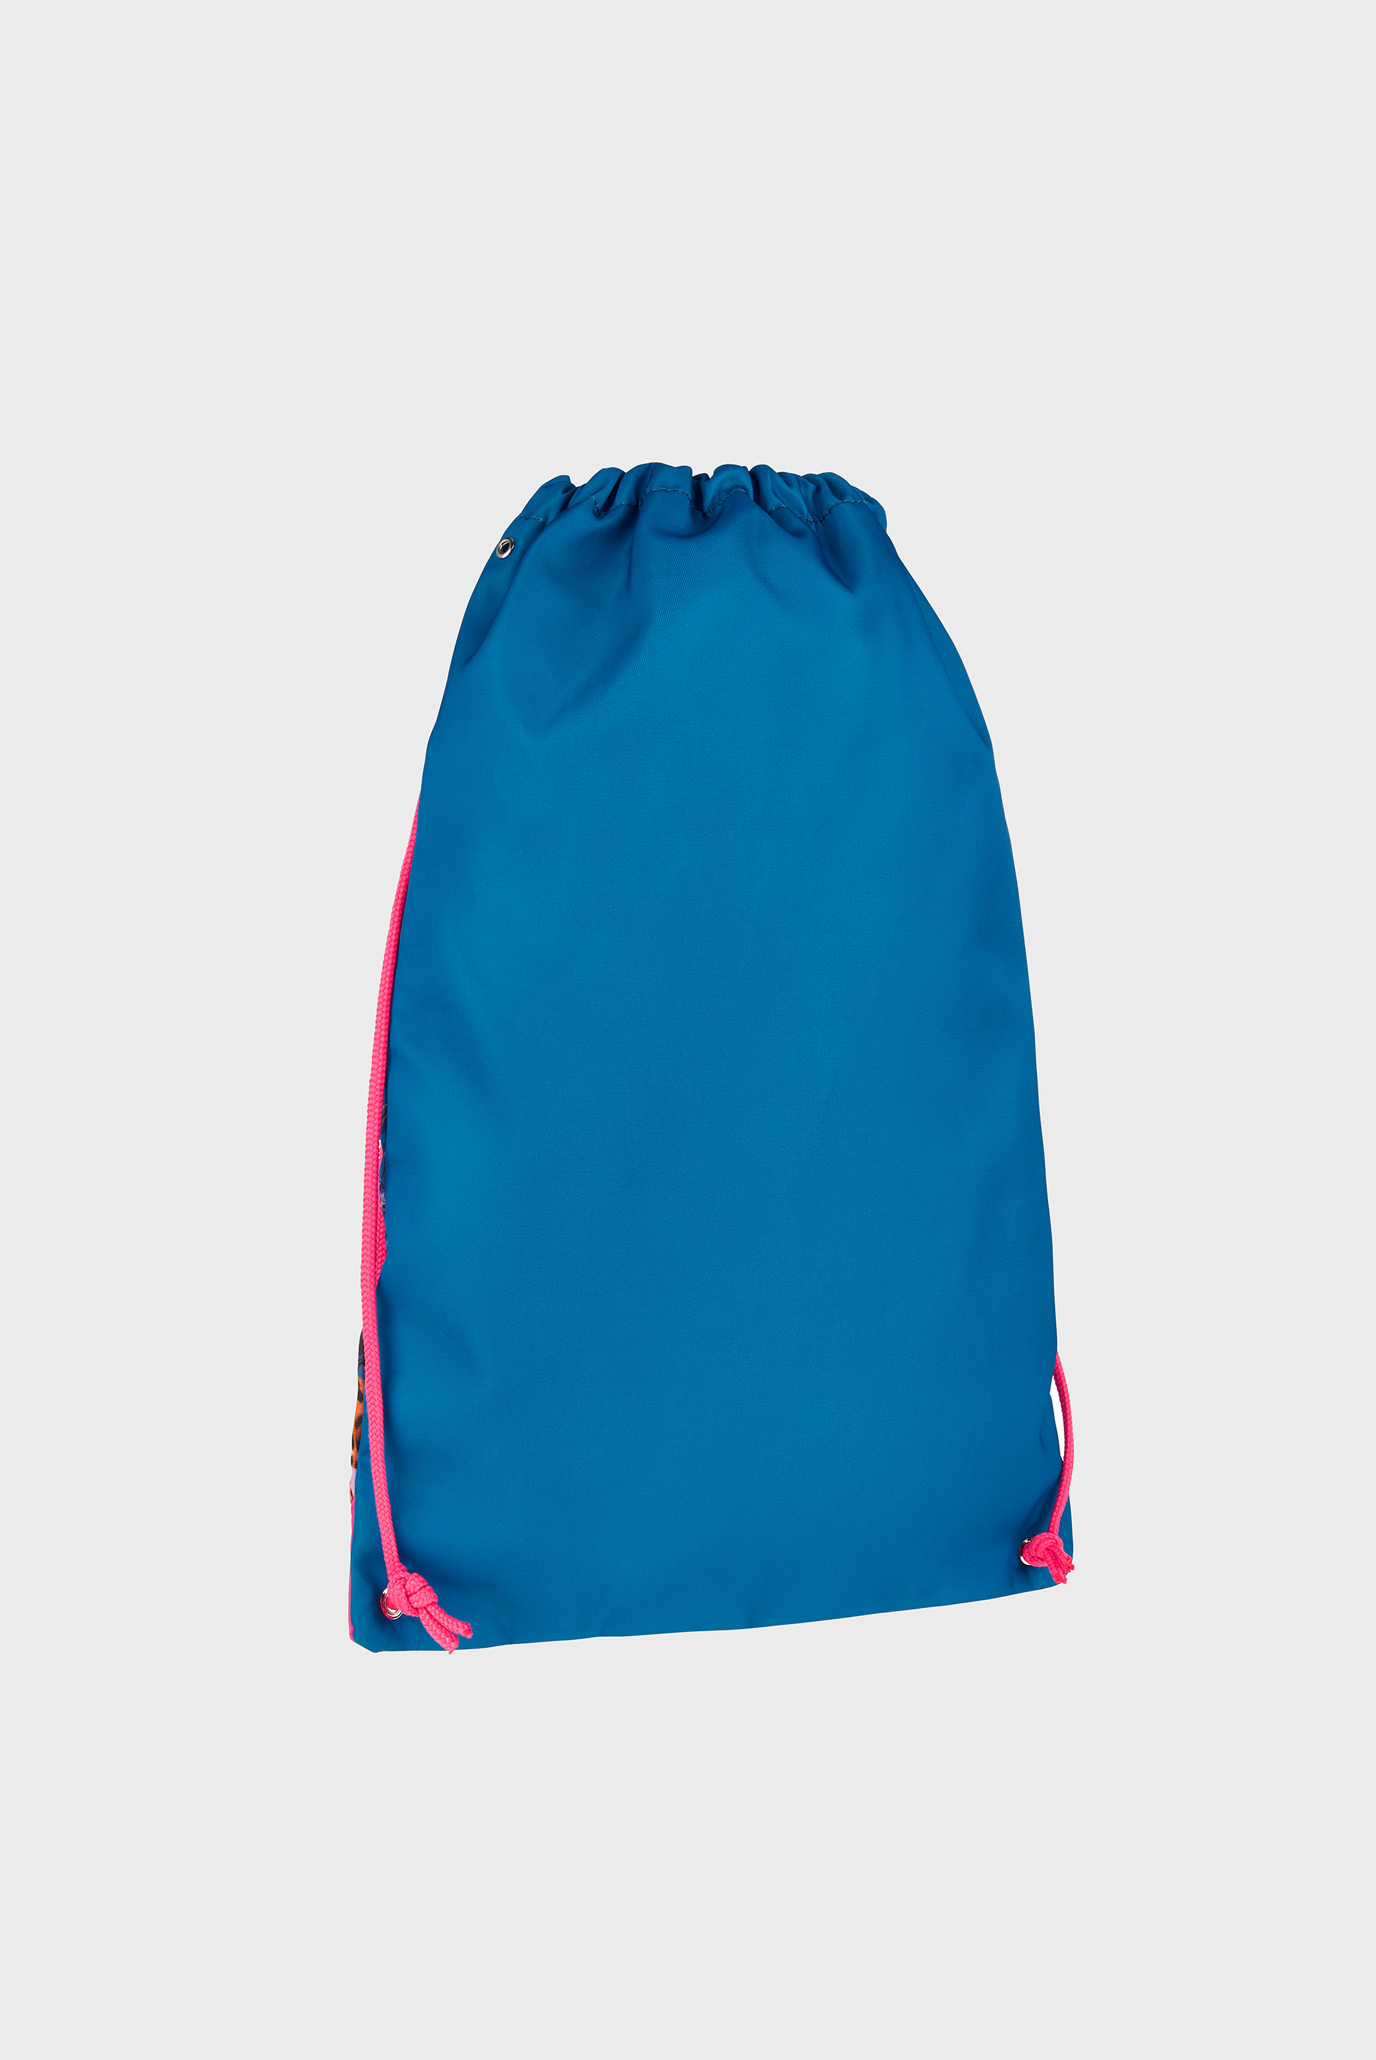 Детский синий рюкзак Floral Leopard Draws Monsoon Children